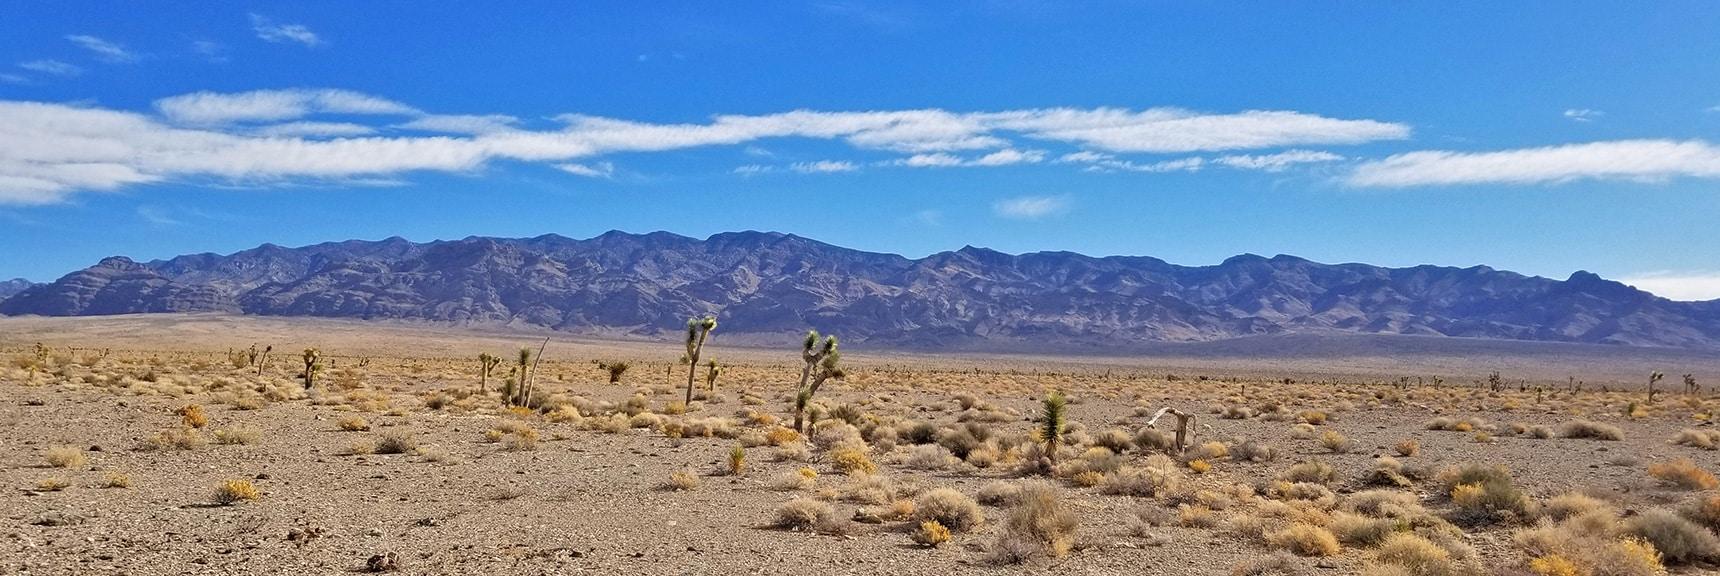 View Spanning the West Side of the Sheep Range from Alamo Road   Lower Alamo Road   Sheep Range   Desert National Wildlife Refuge, Nevada